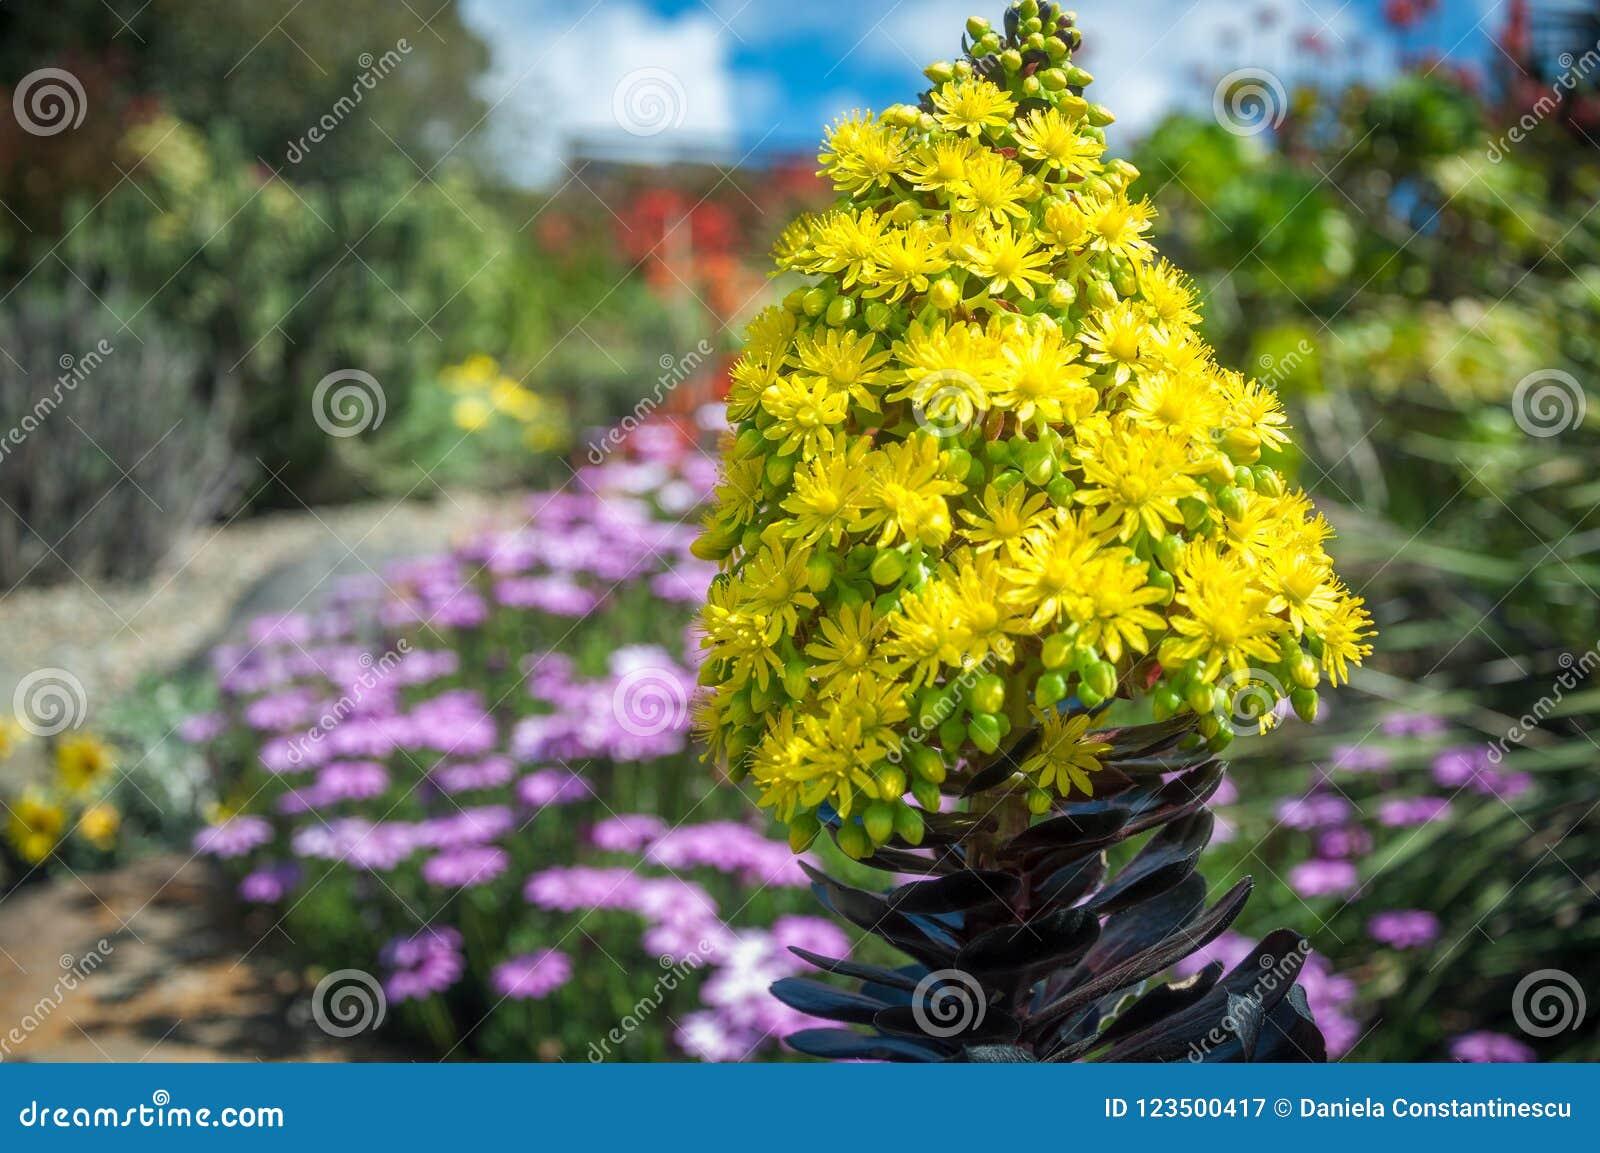 Beautiful yellow flowers on a garden background stock image image download beautiful yellow flowers on a garden background stock image image of concept field mightylinksfo